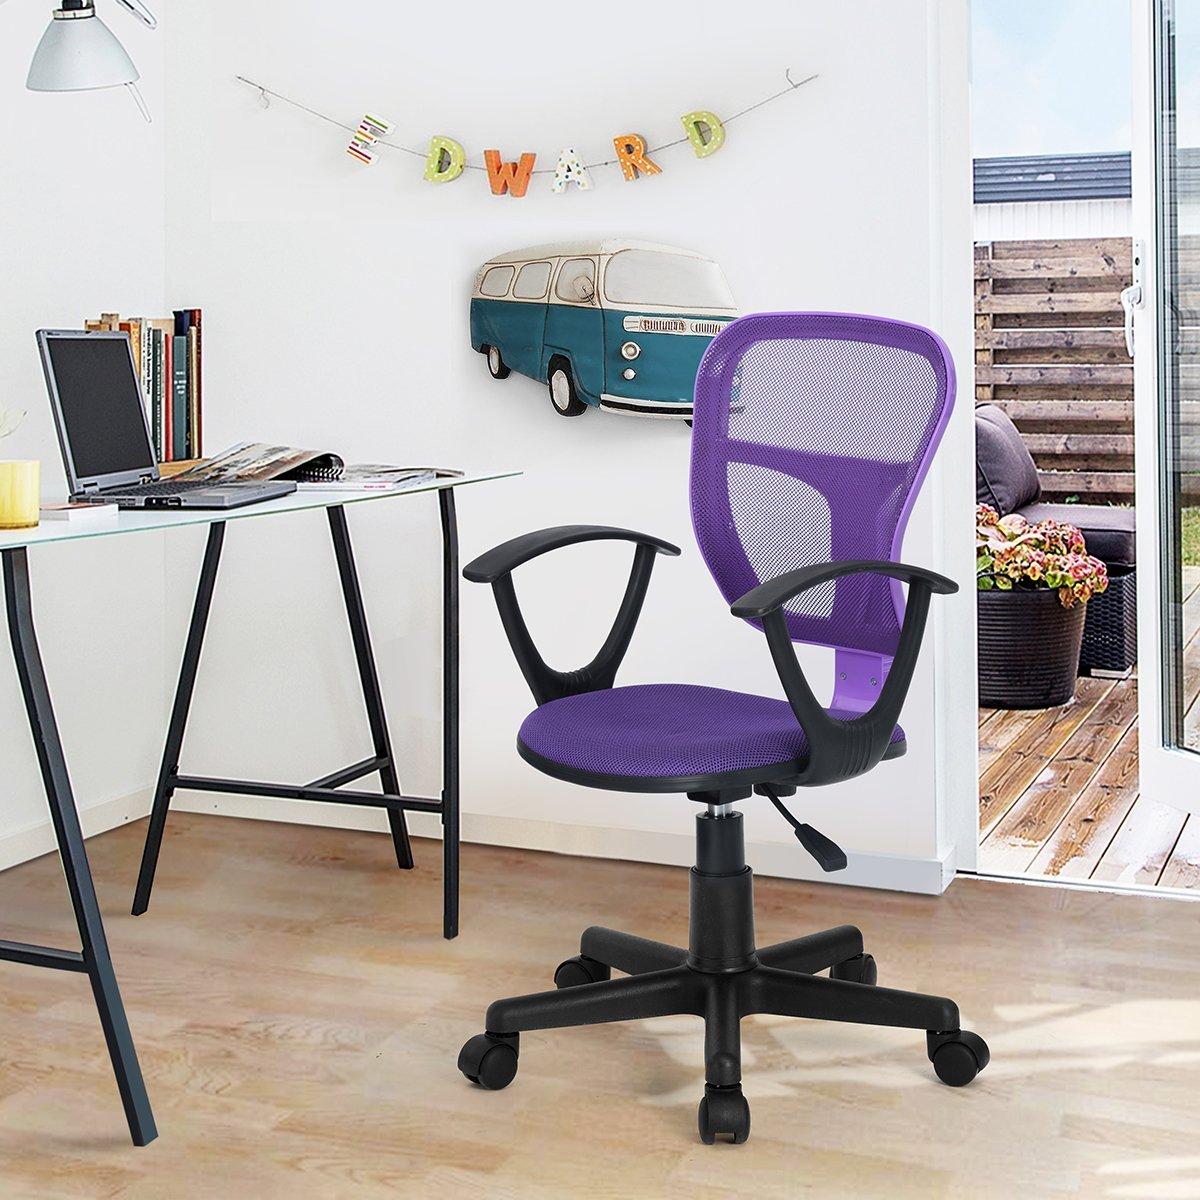 HOMY CASA Swivel Work Office Desk Task Chair   Mid Century Modern Mid-Back Height Adjustable Upholstered Velvet Foam Cushion Seat with 360 Rotation & Castor Wheels (MESH ARM Purple)